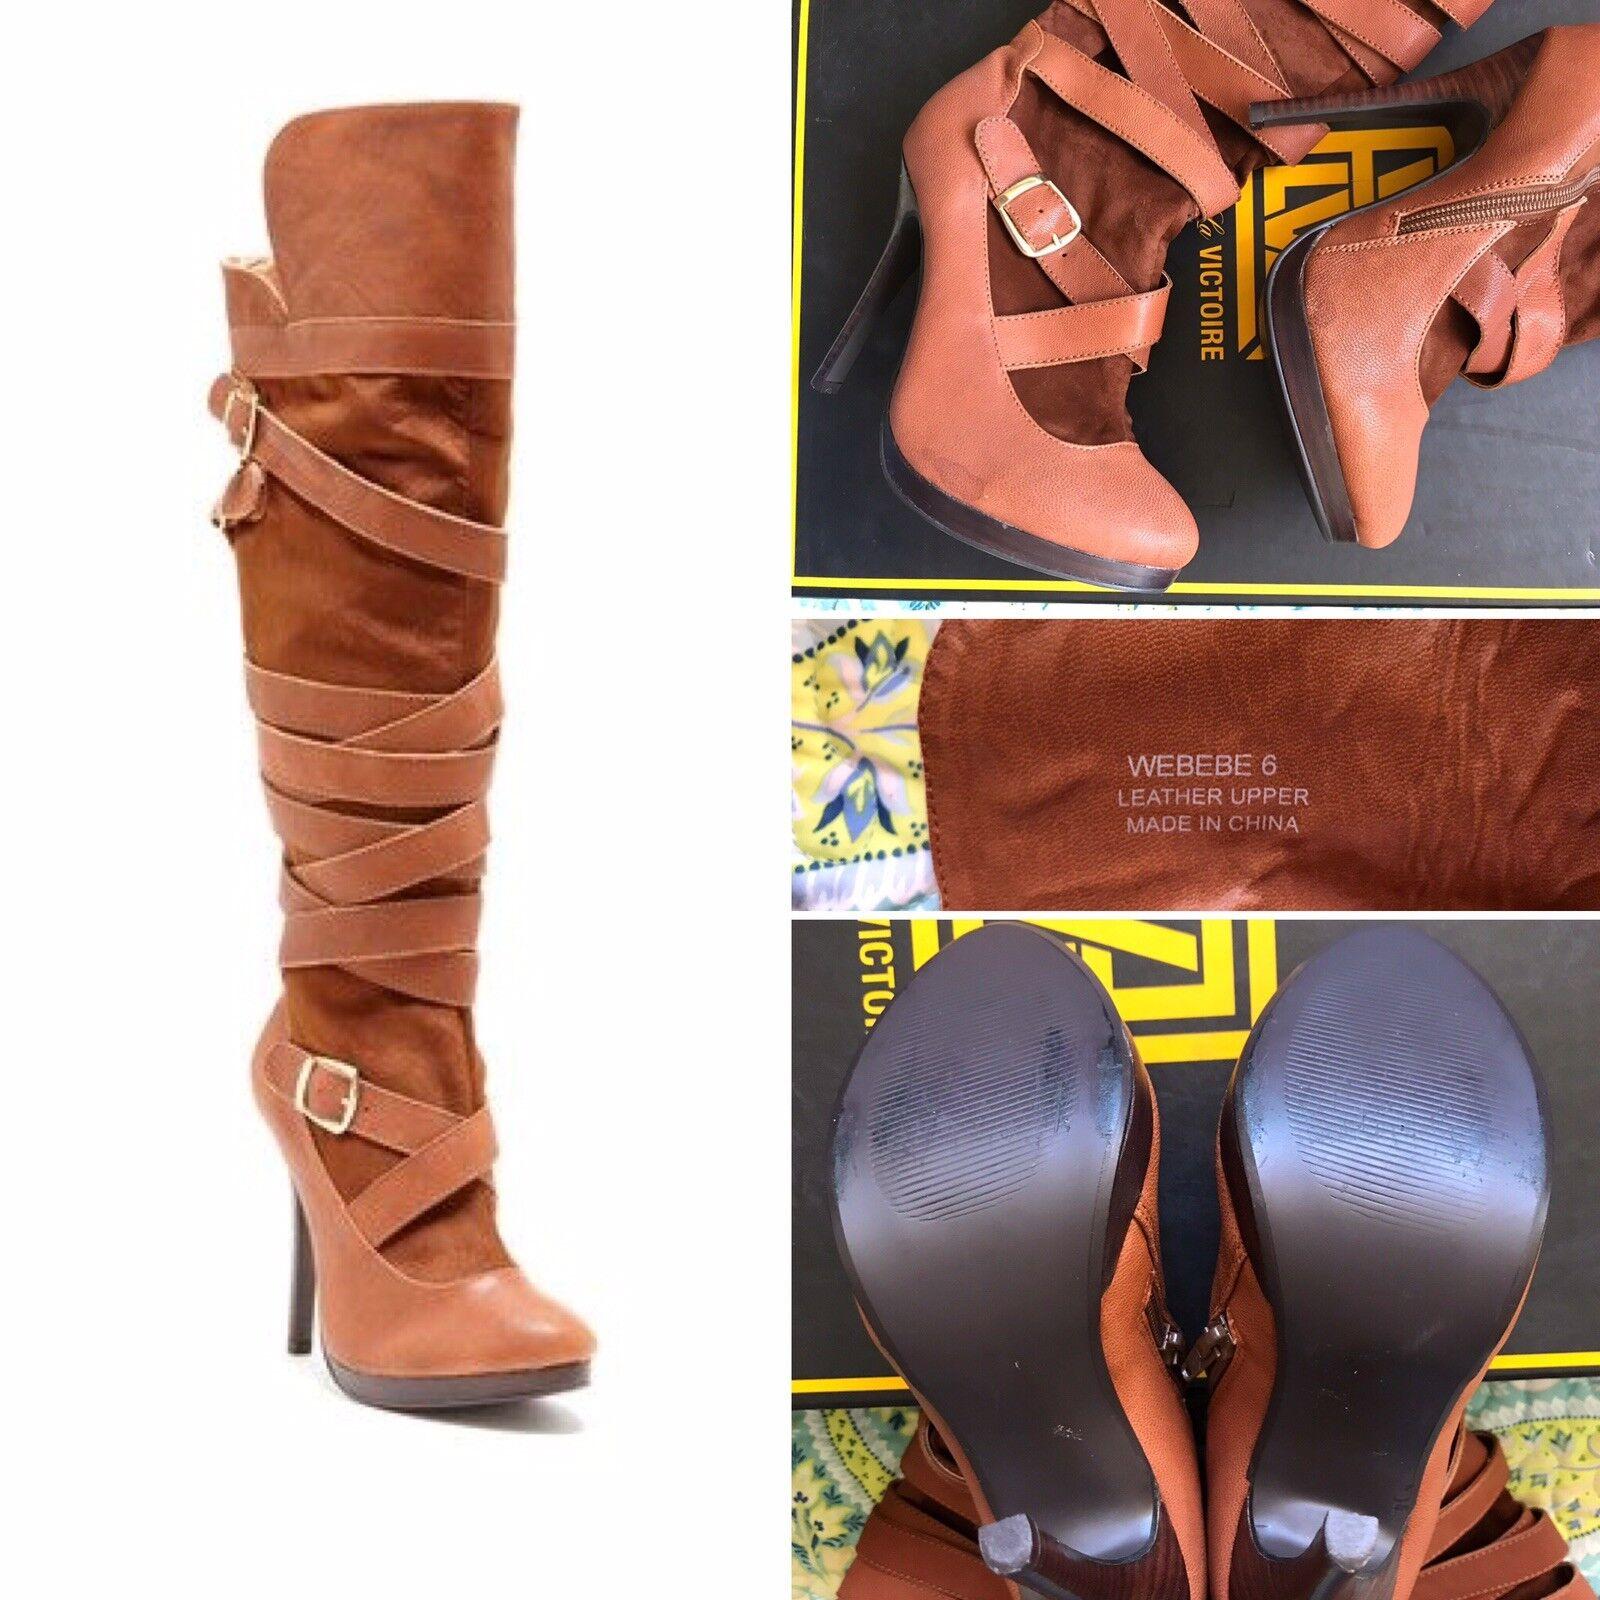 N.Y.L.A. Webebe Strap Knee High Tan Cognac Boots 6 NWOB